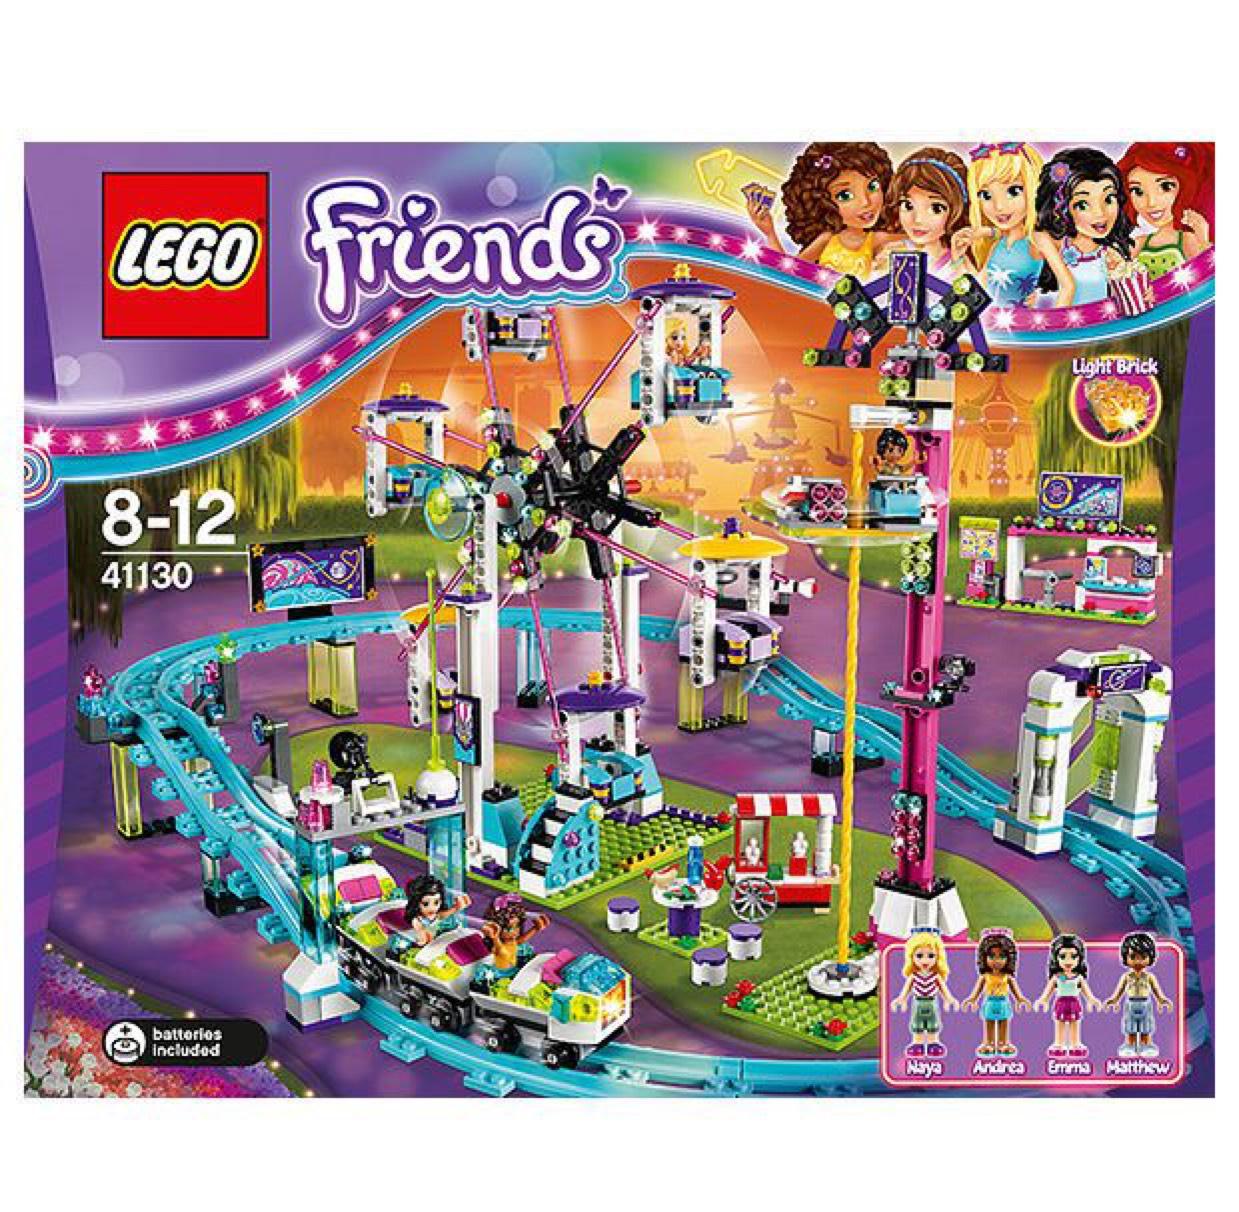 LEGO Friends Amusement Park Roller Coaster 41130 - £58.99 @ Amazon